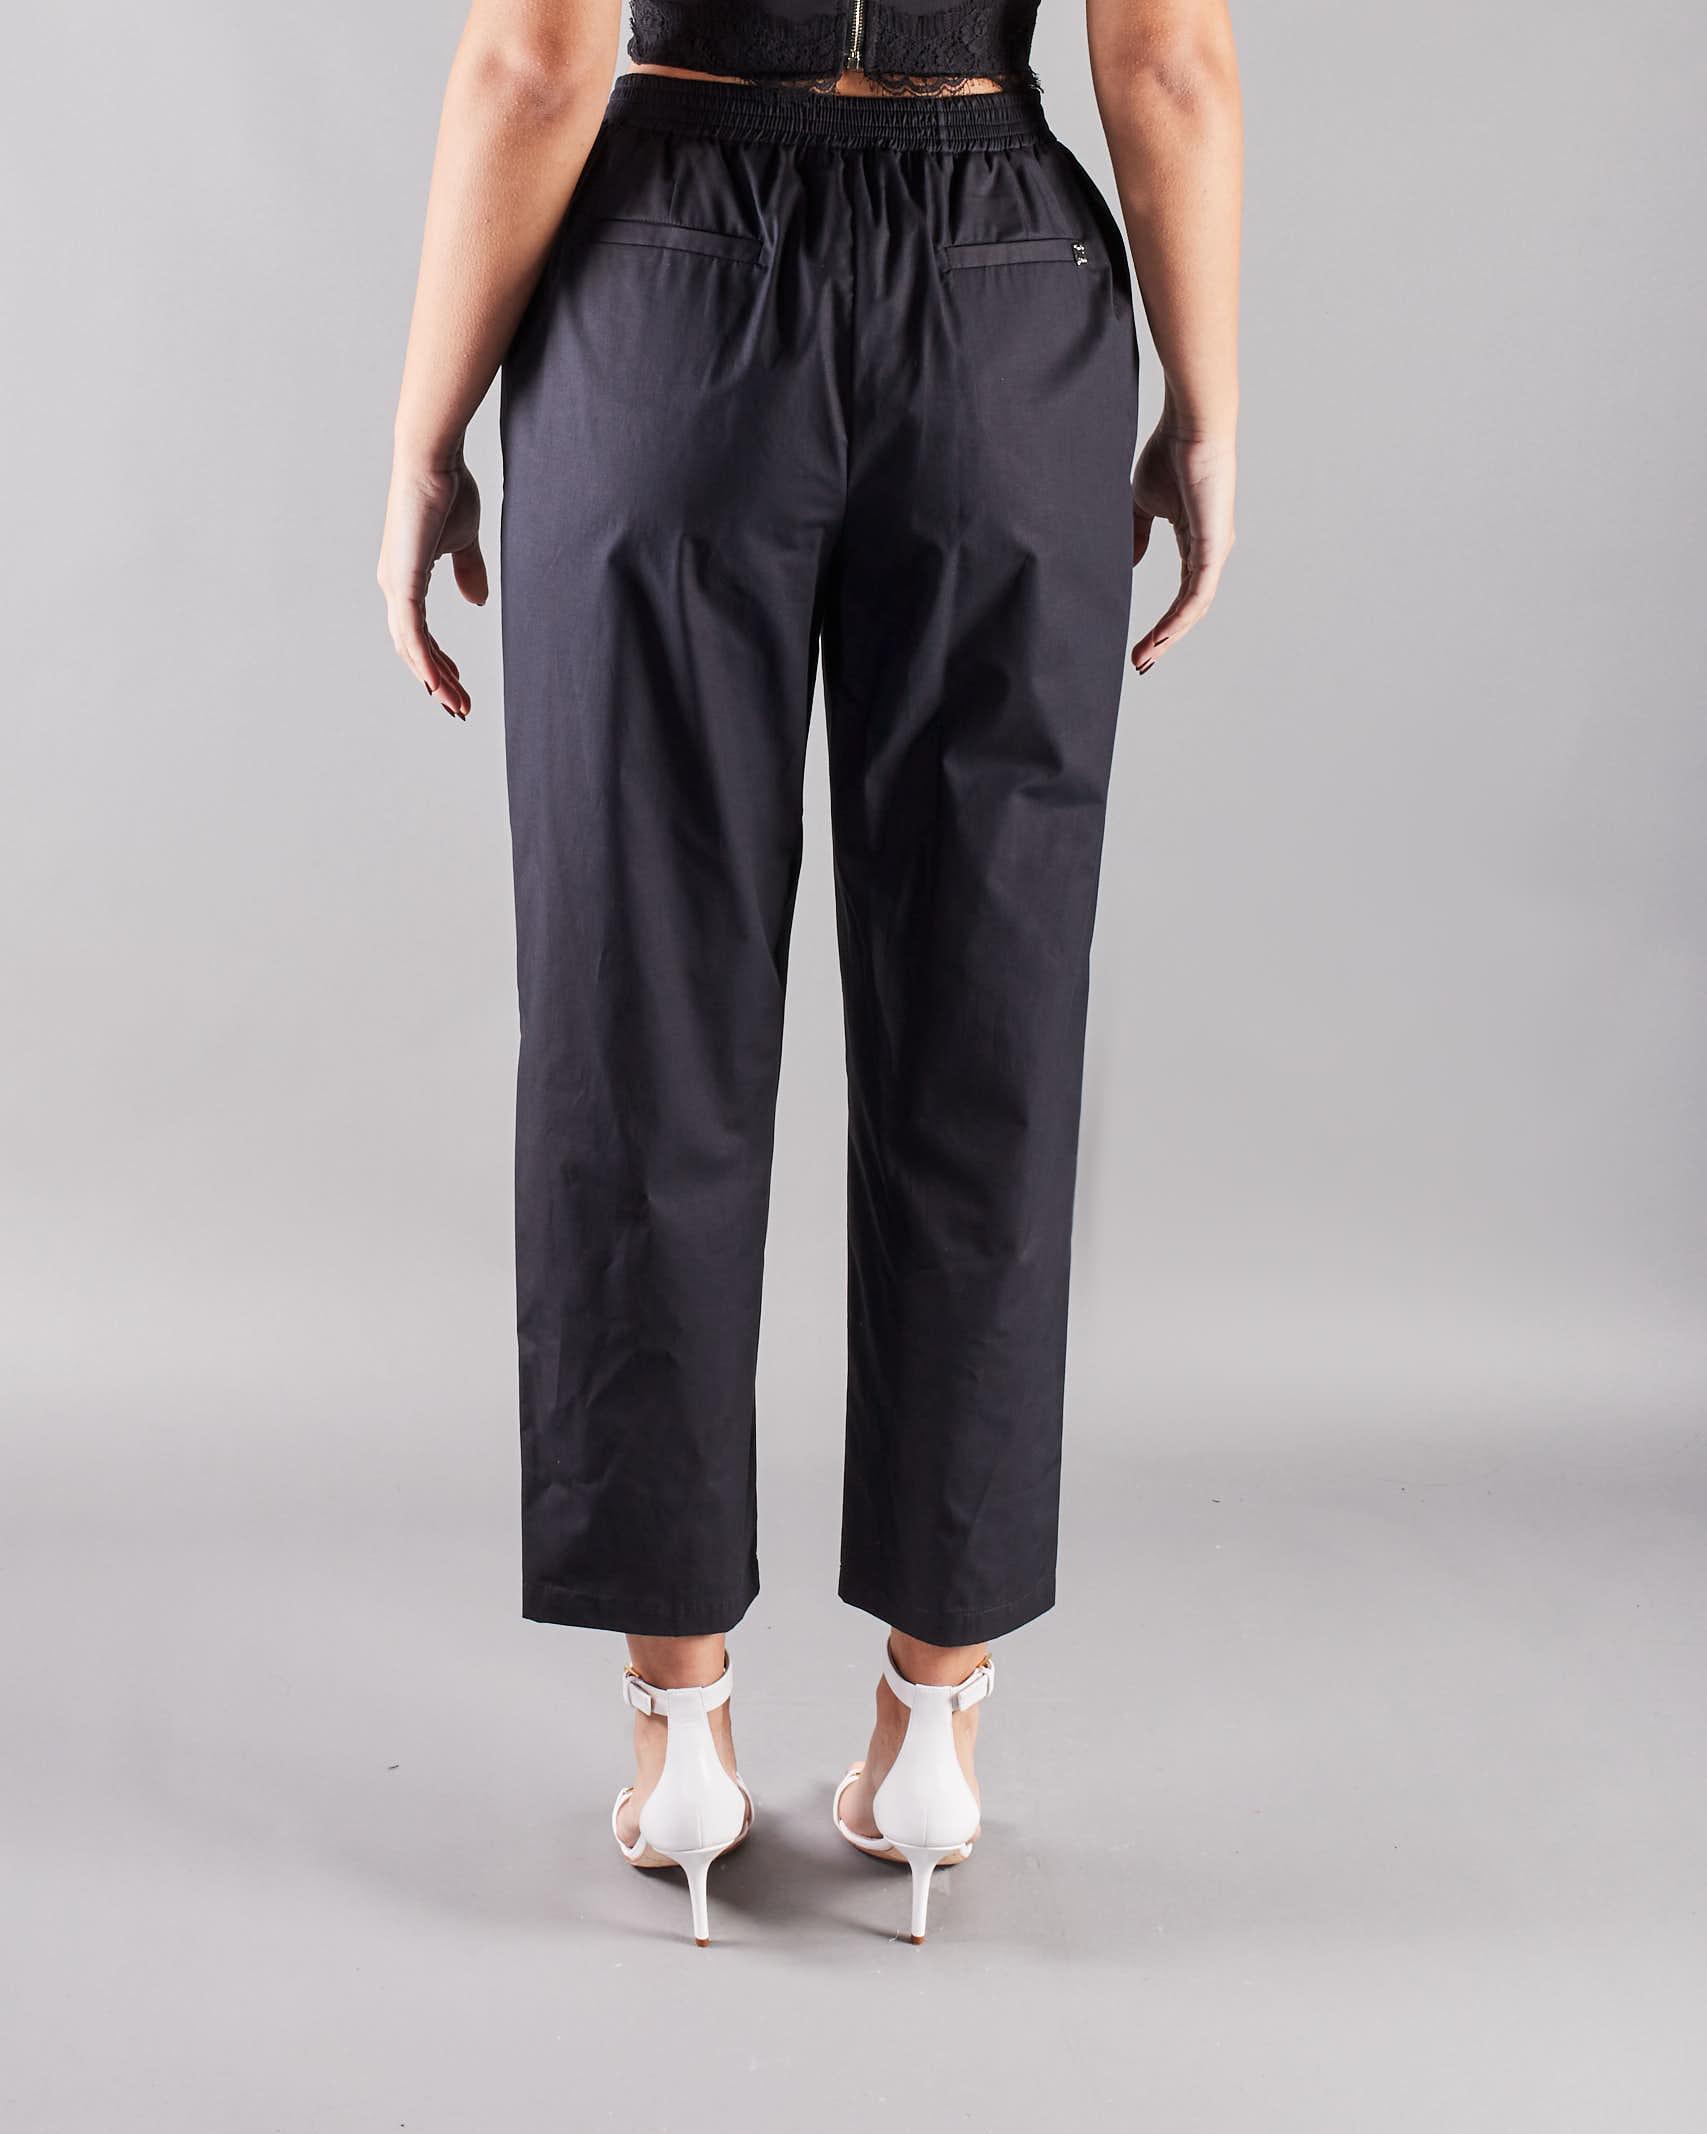 Pantalone con elastico Manila Grace MANILA GRACE | Pantalone | P008CUMA001